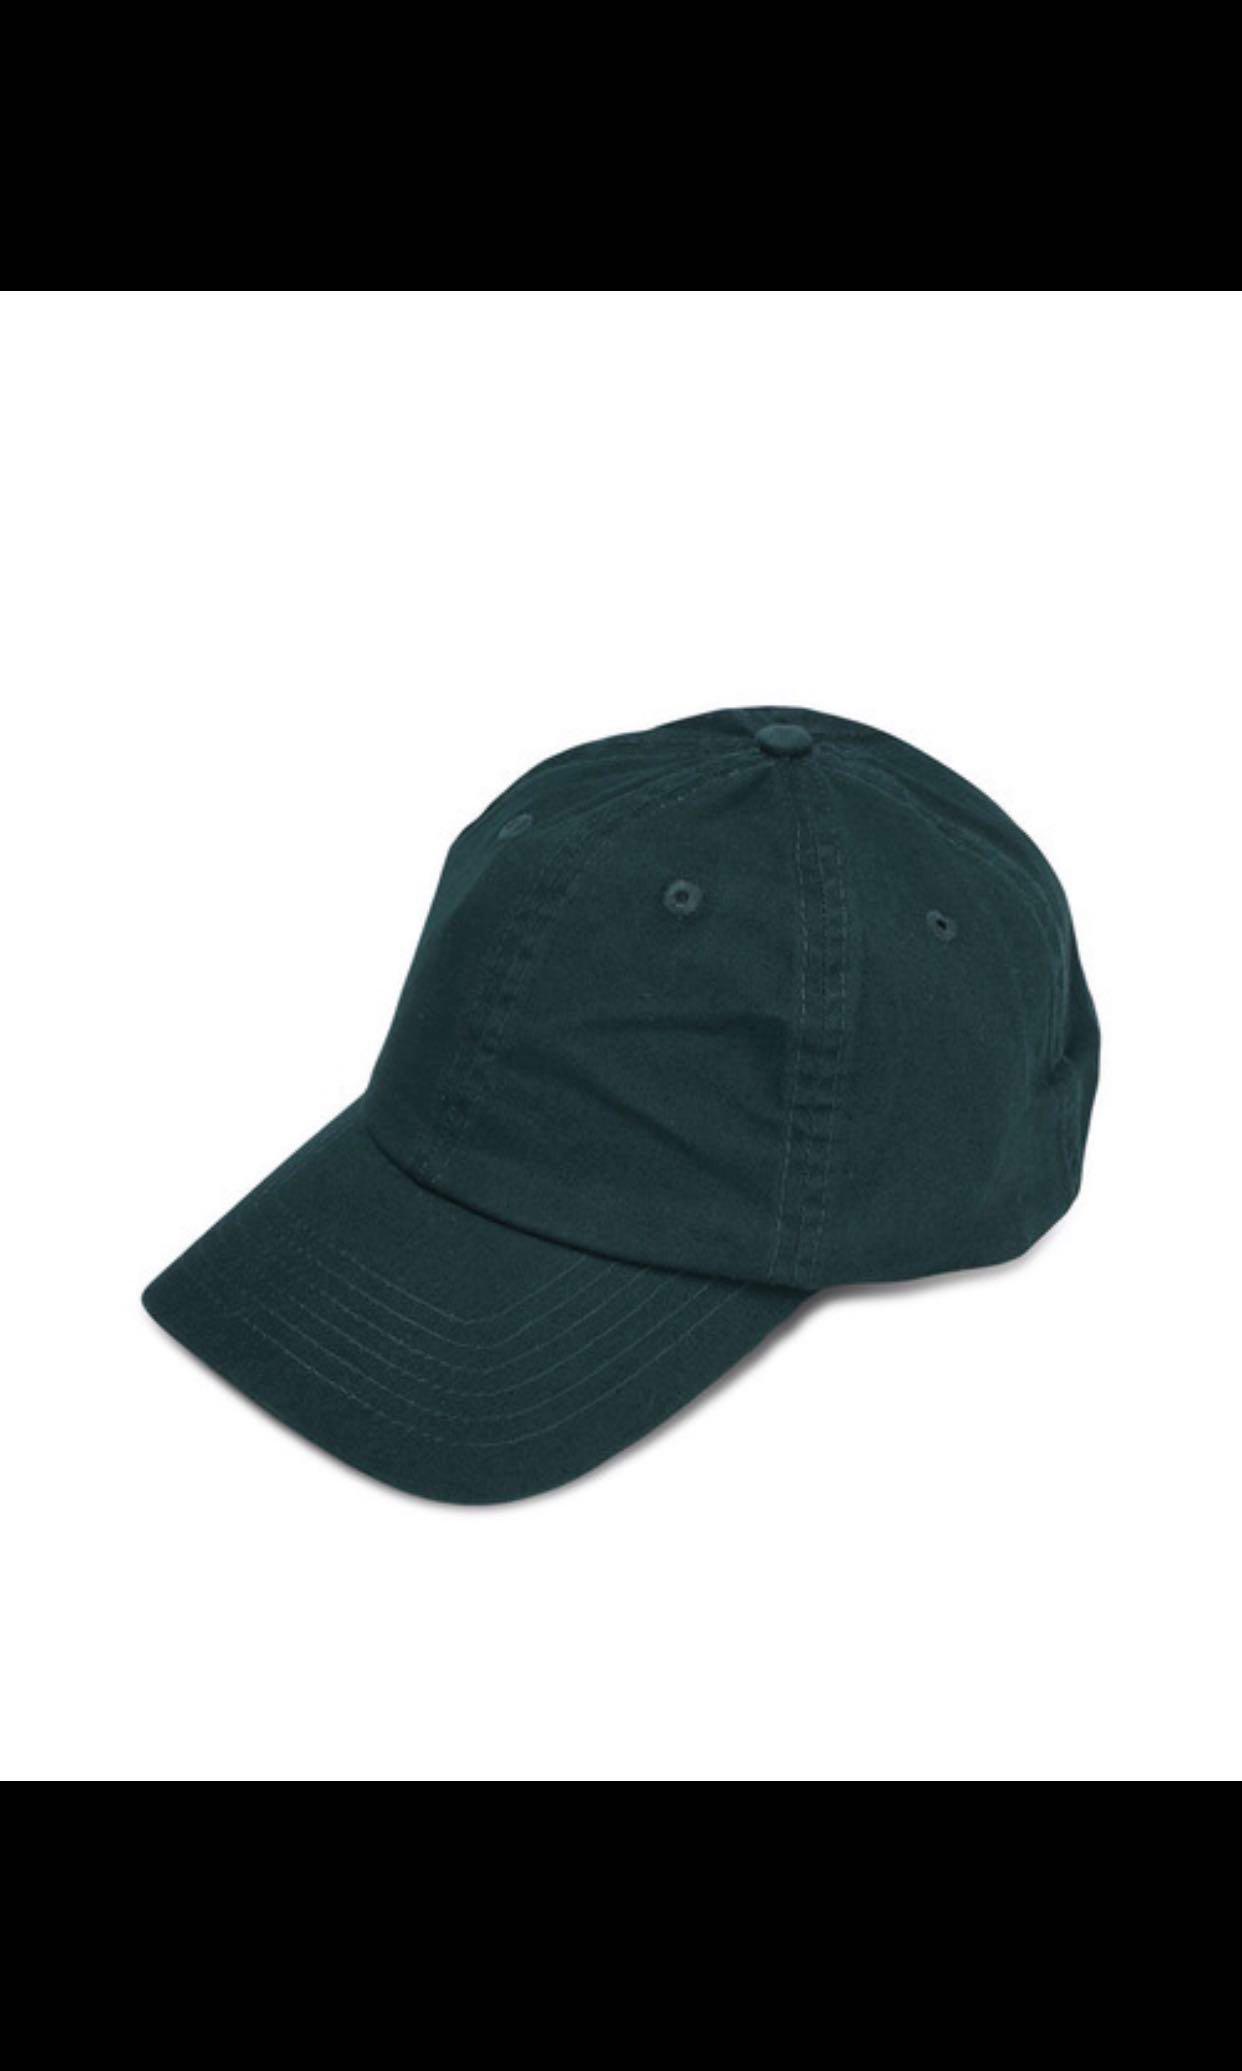 521f3be2d Topman Alpine Green Cap